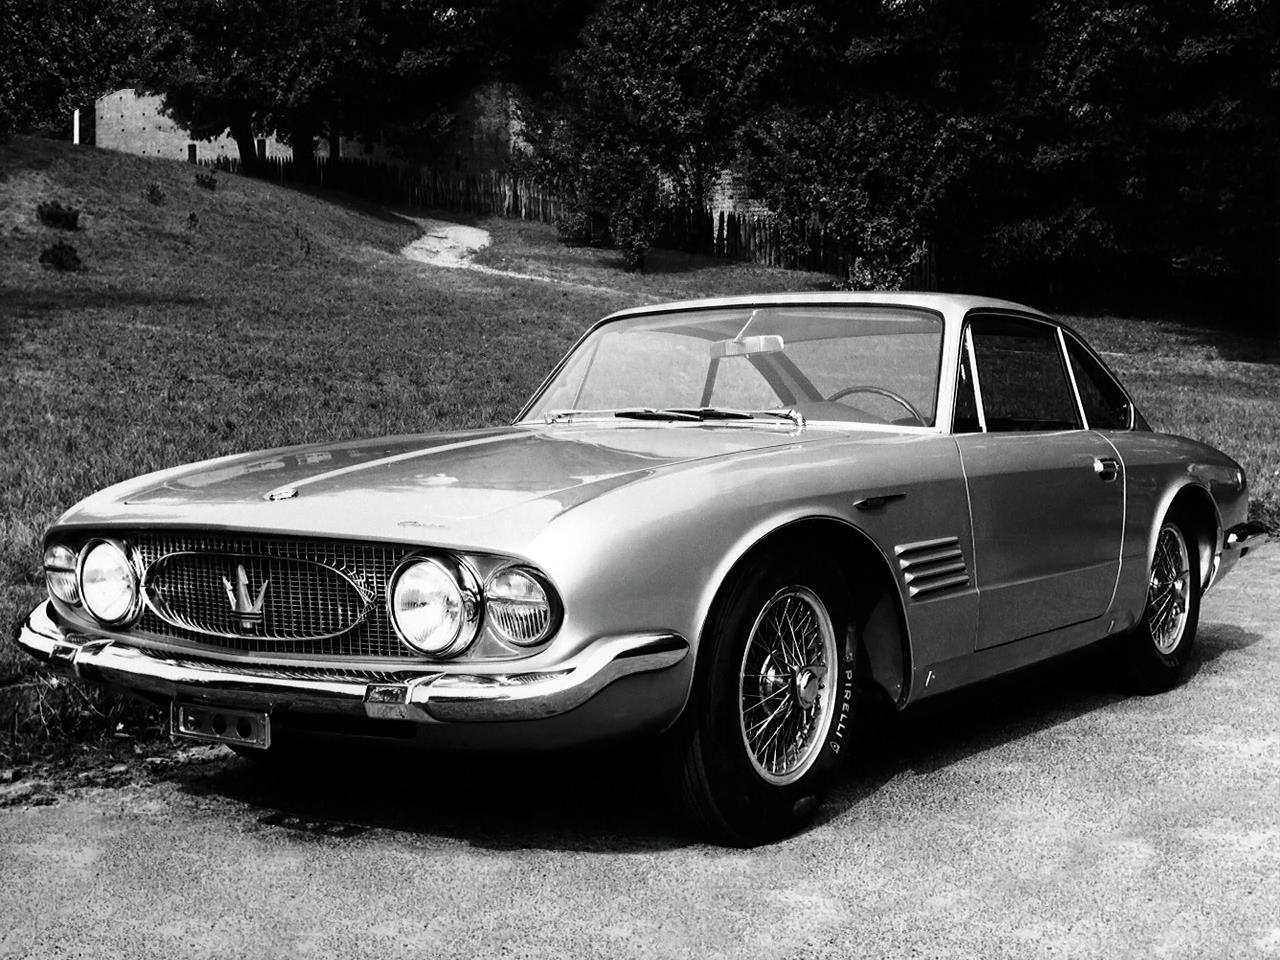 ... 1963 Maserati 5000 Gt Ghia Coupe ...